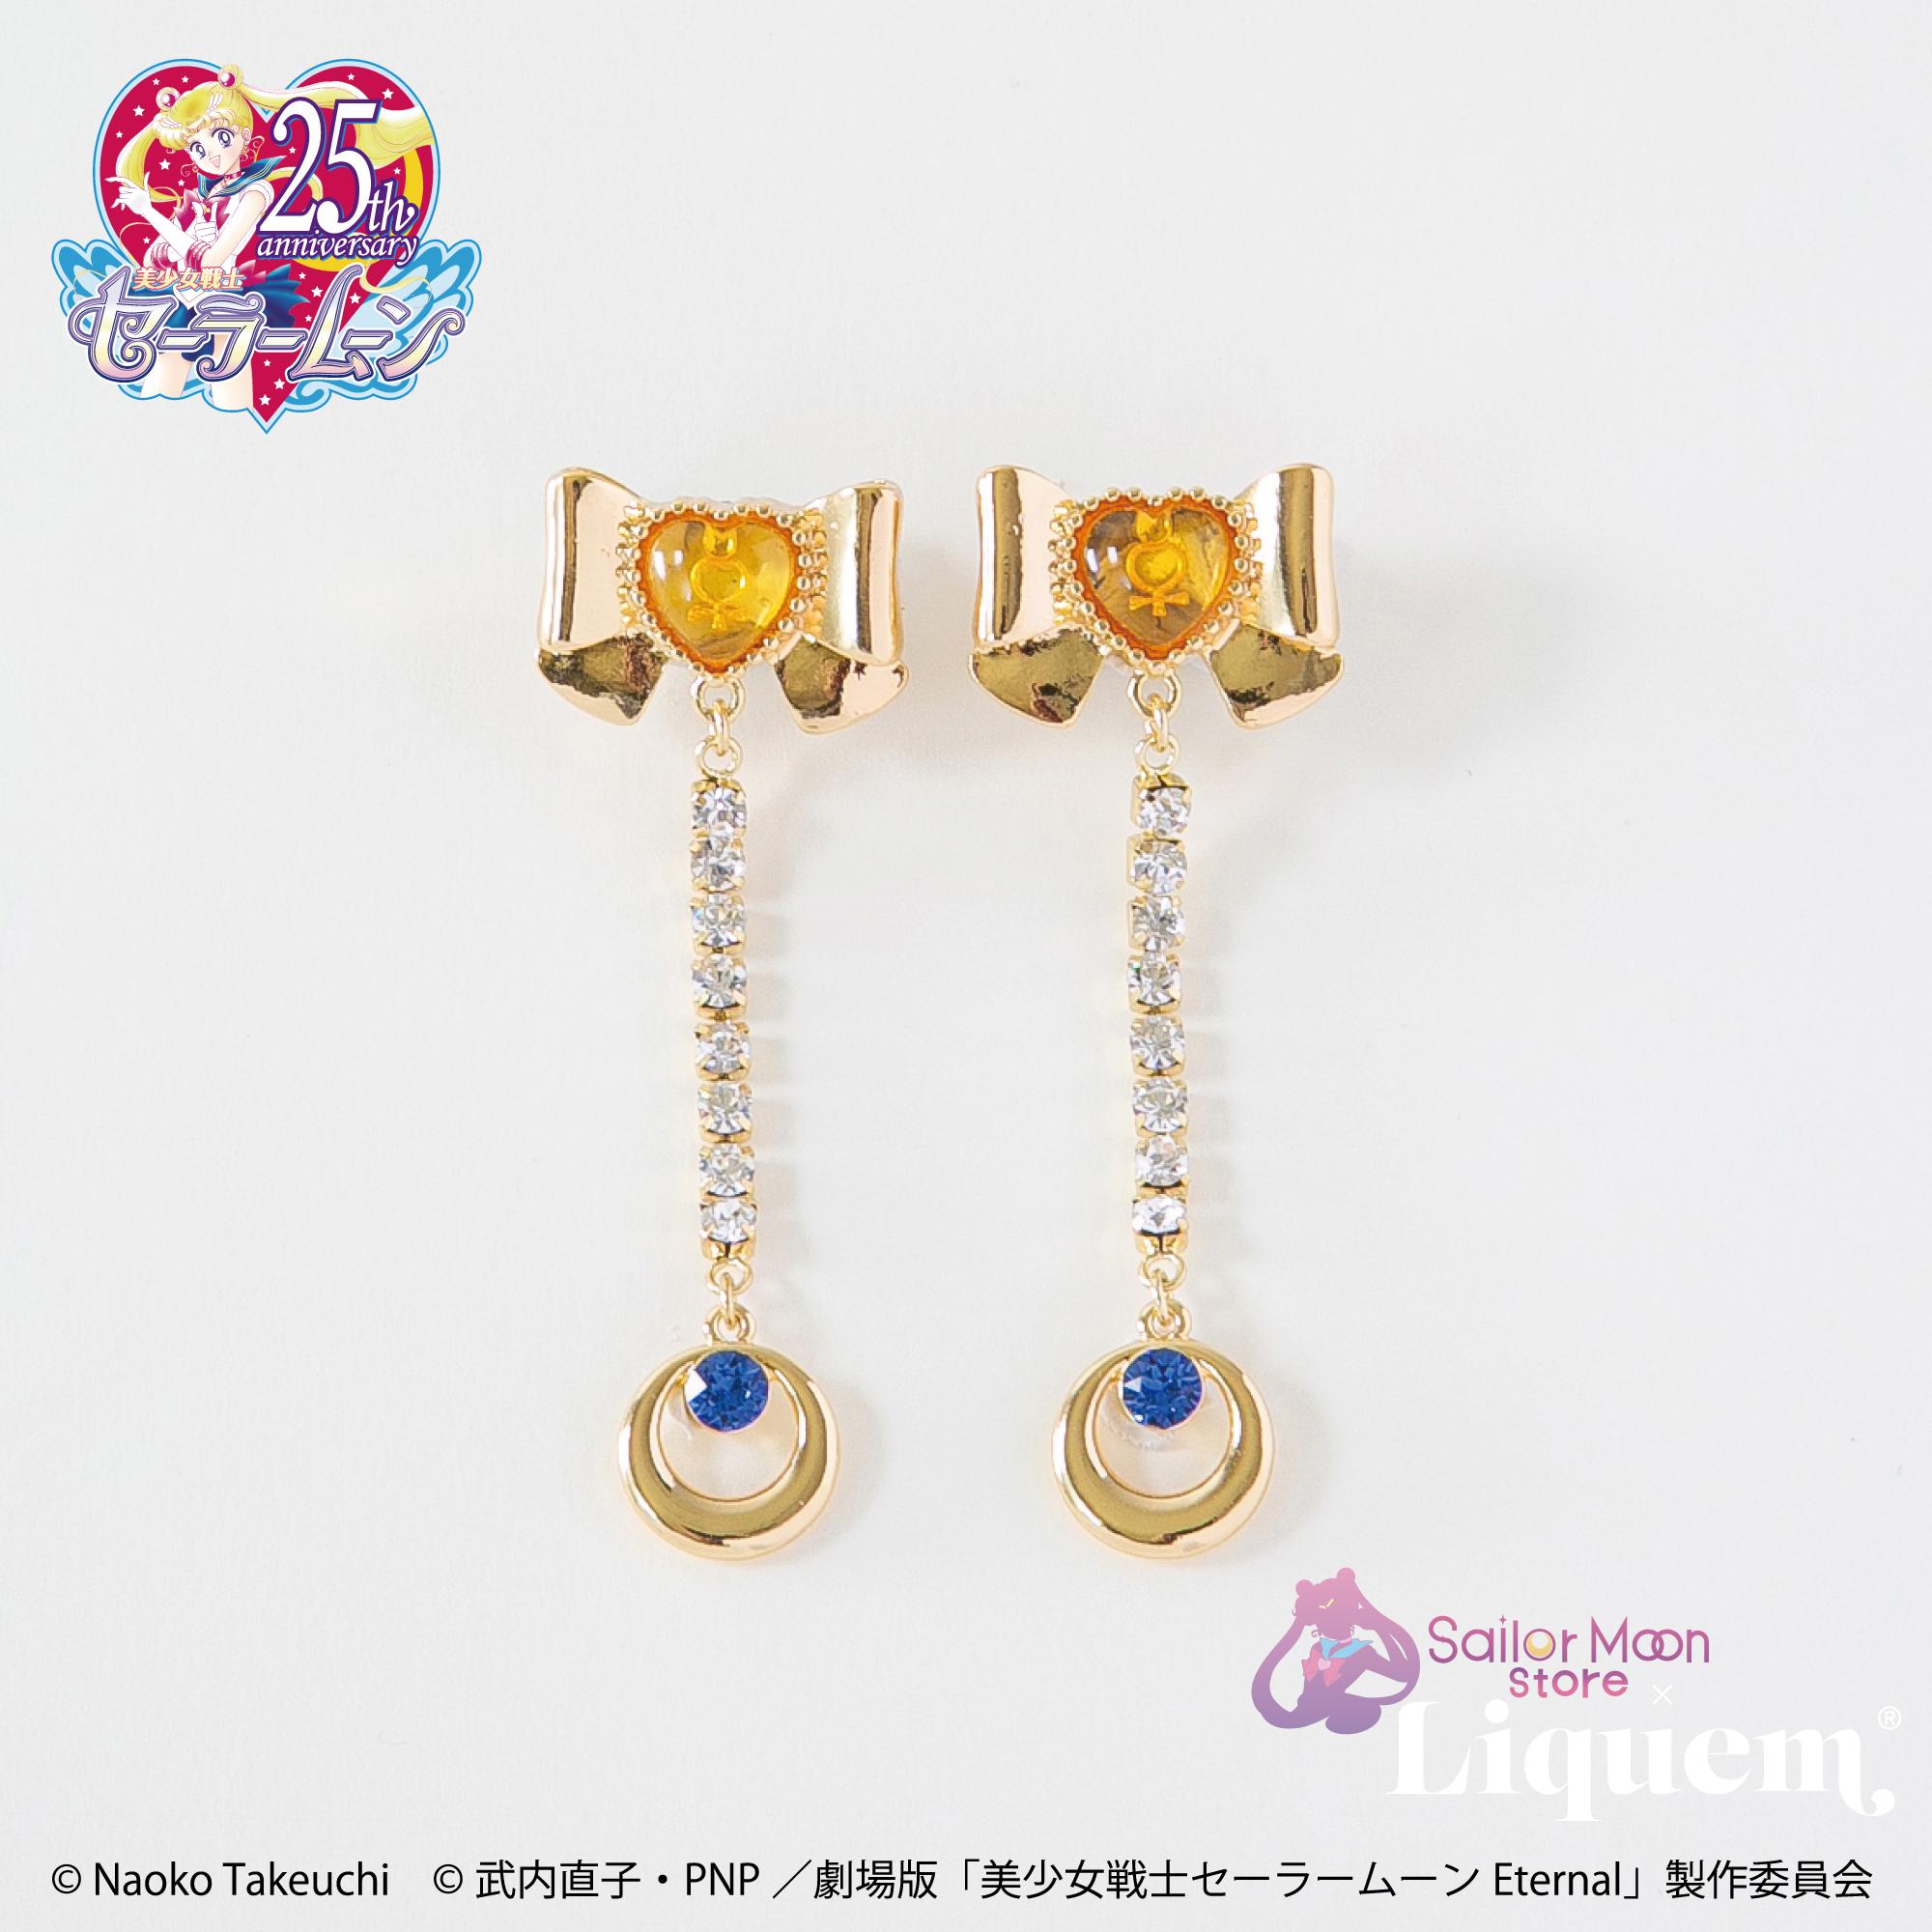 Sailor Moon store x Liquem / スーパーセーラーヴィーナスリボン・ピアス